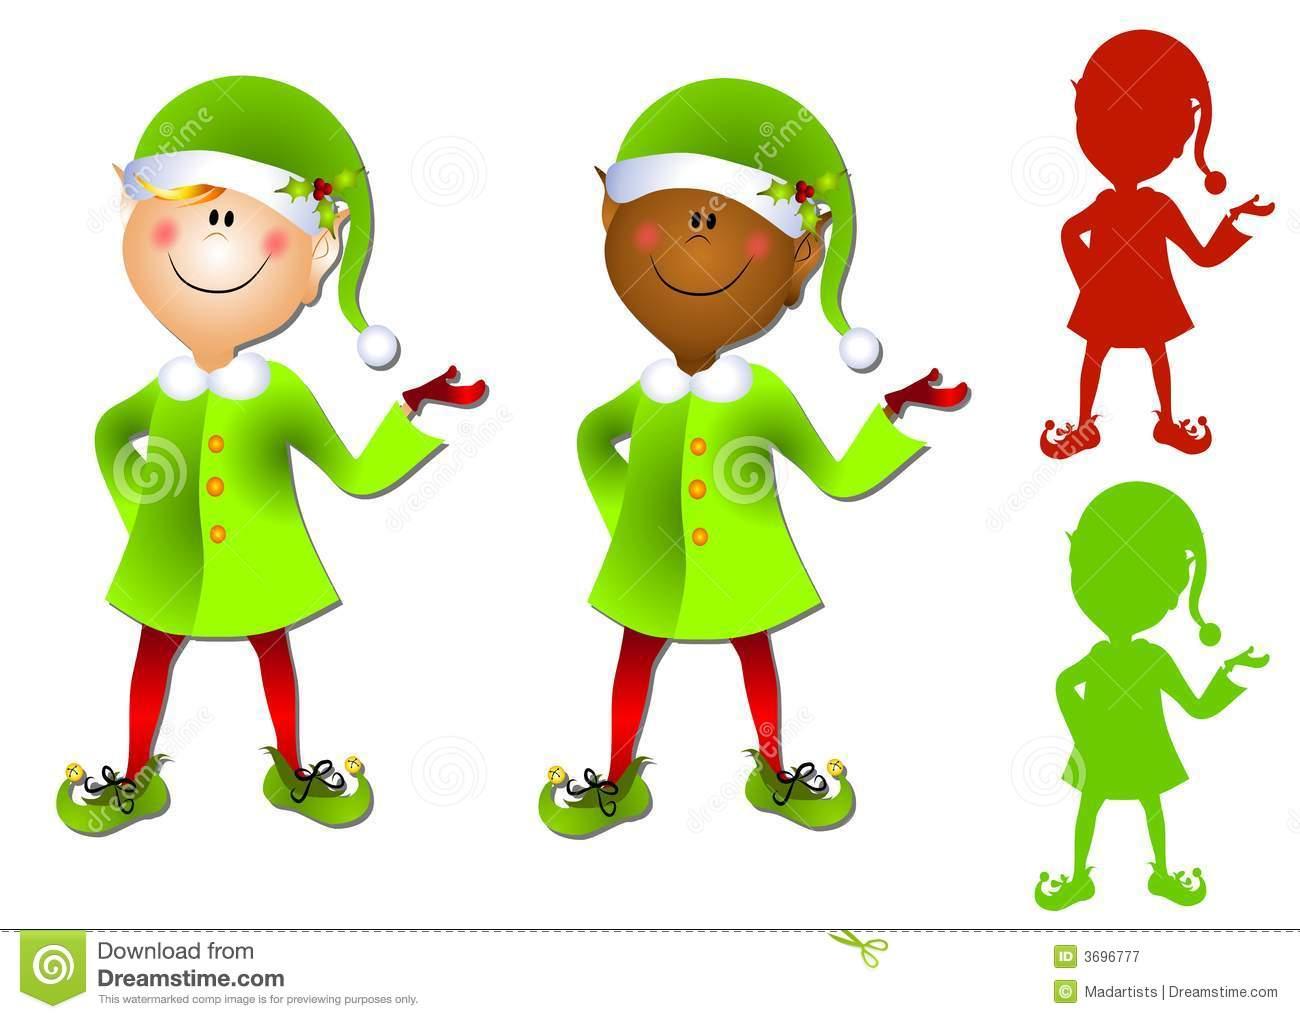 Animated Christmas Elves Clipart - Clipart Kid